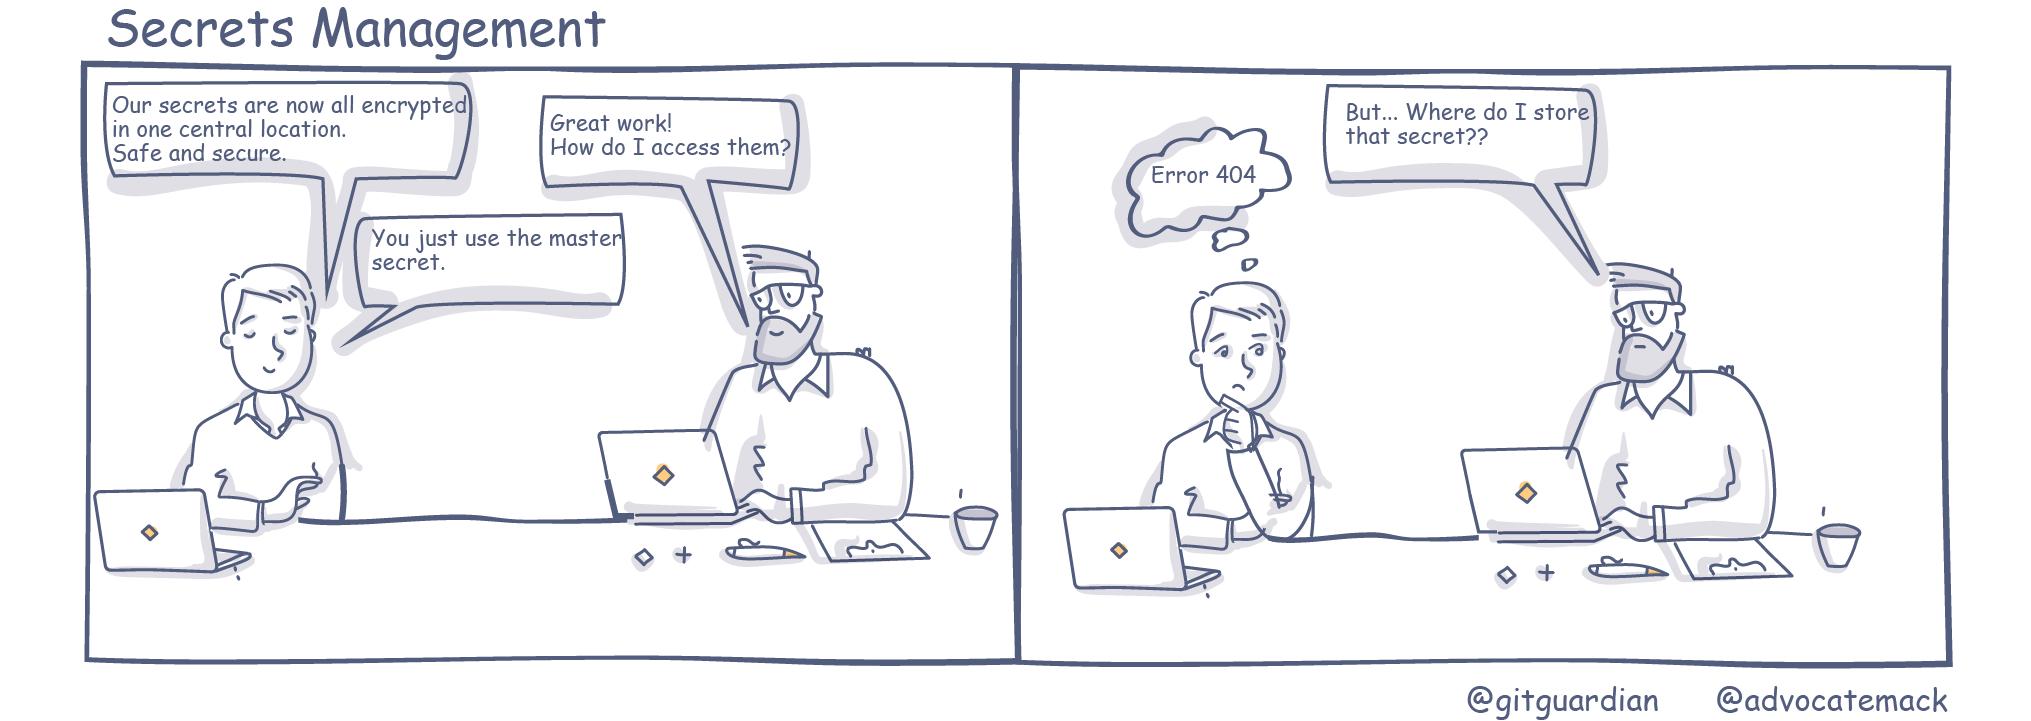 Secrets Management Comic